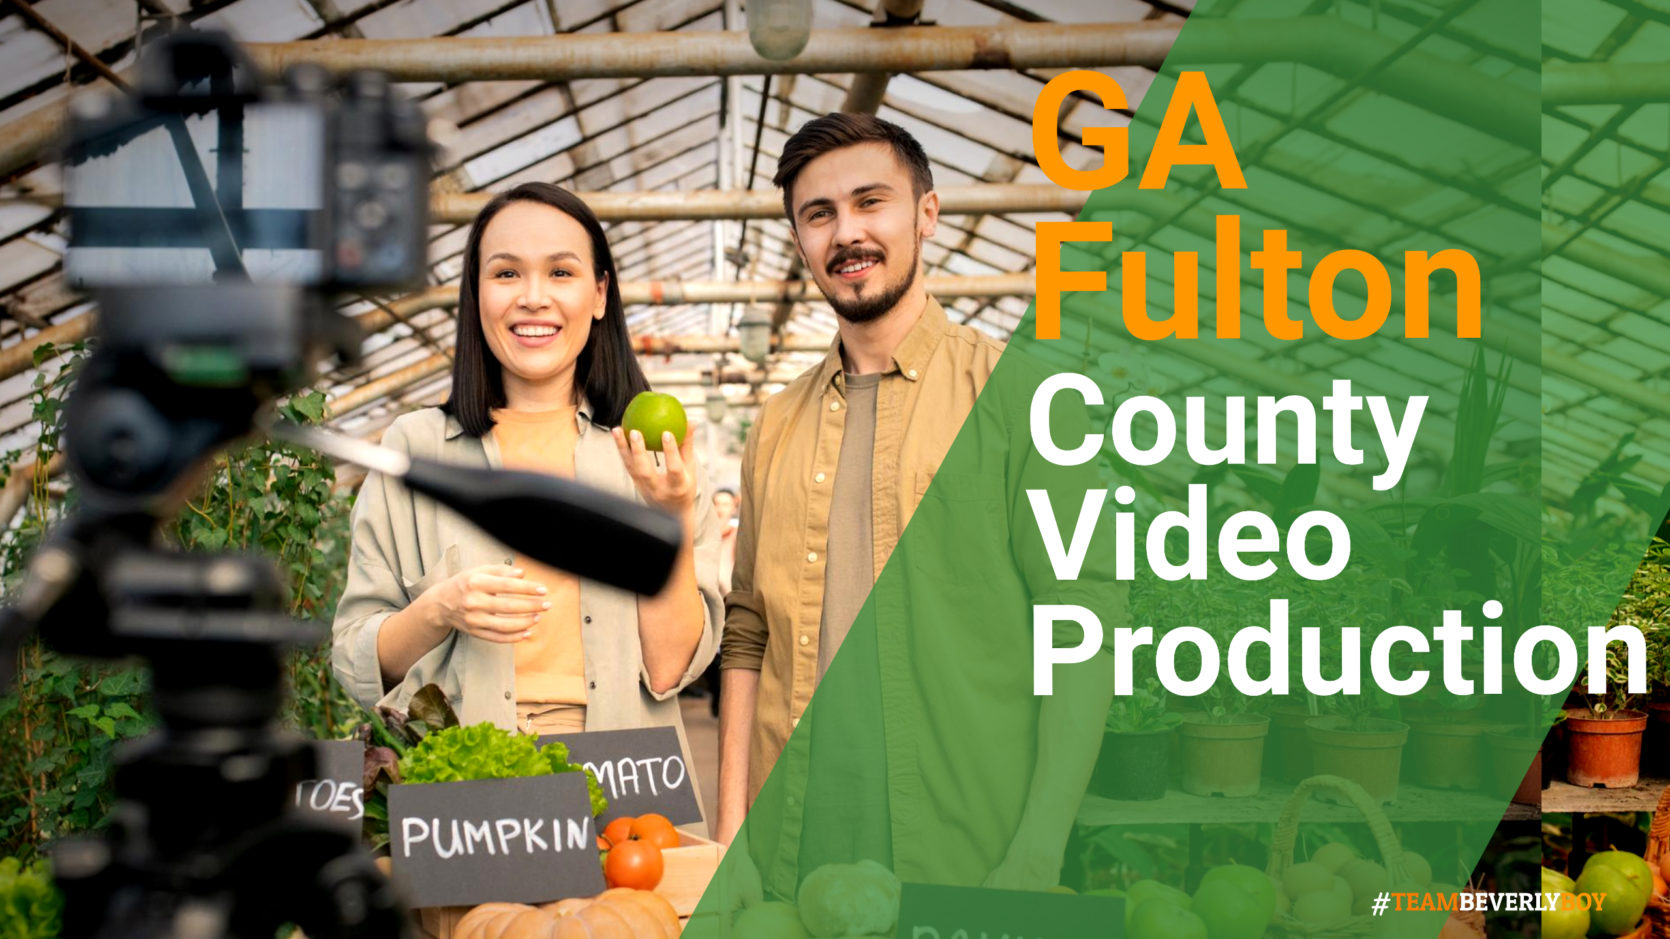 Fulton County GA video production